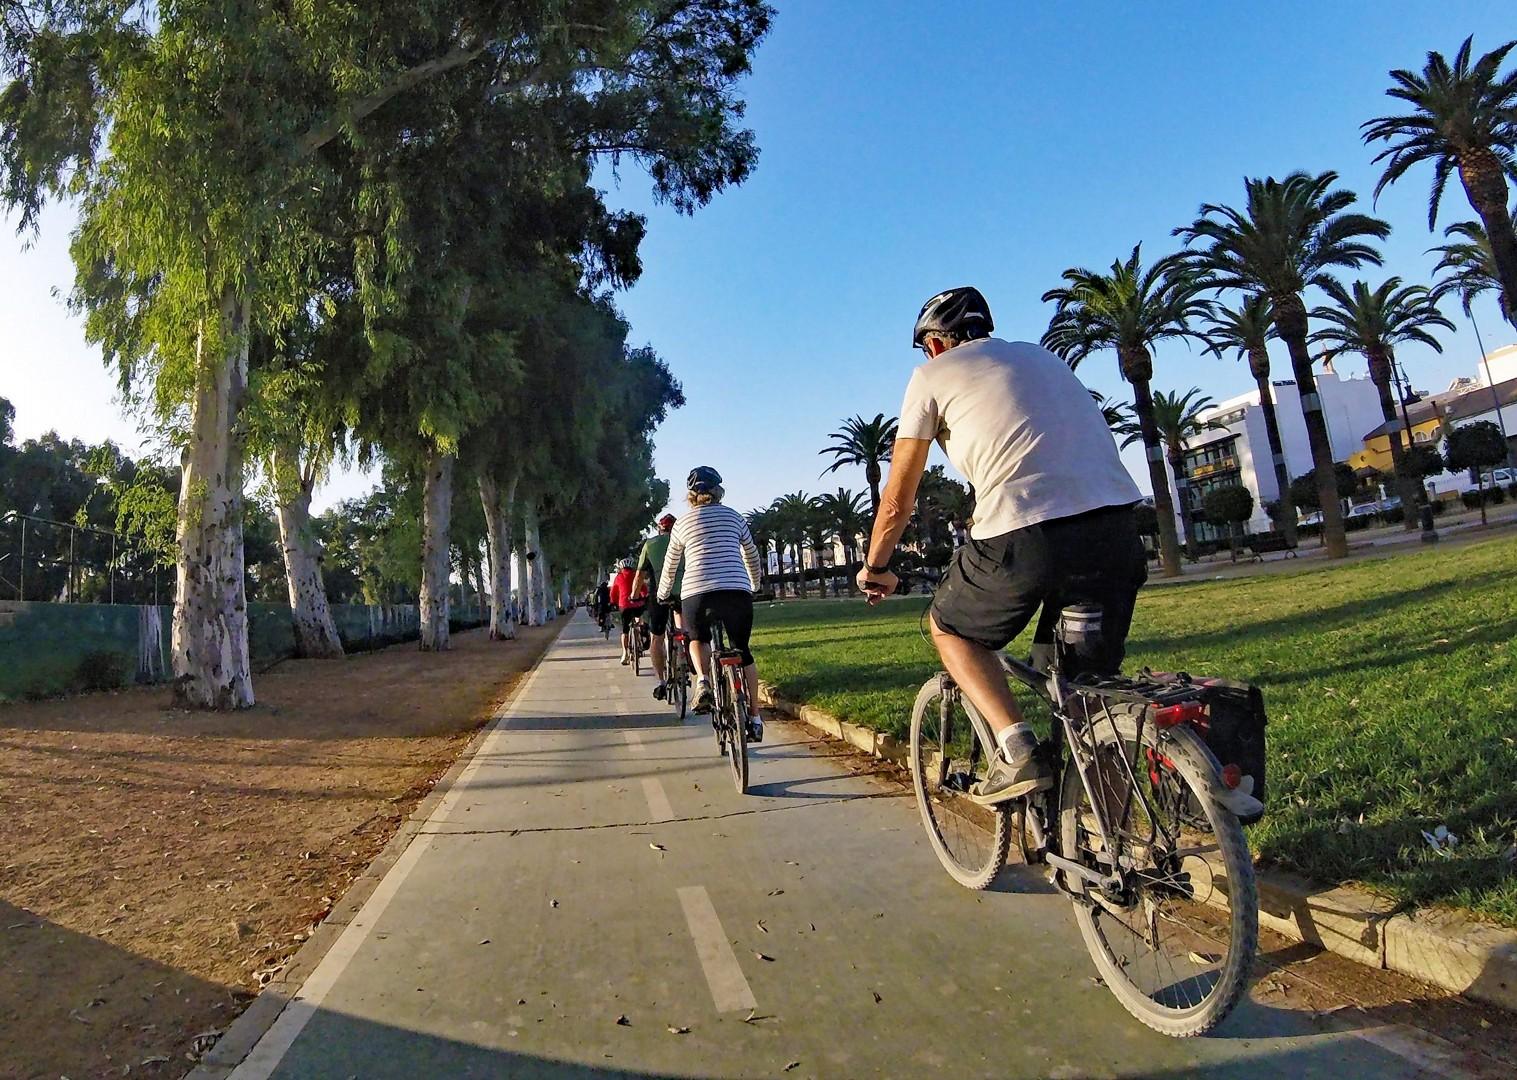 cycling-holiday-in-spain-granada-seville.jpg - Spain - Granada to Seville - Guided Leisure Cycling Holiday - Leisure Cycling